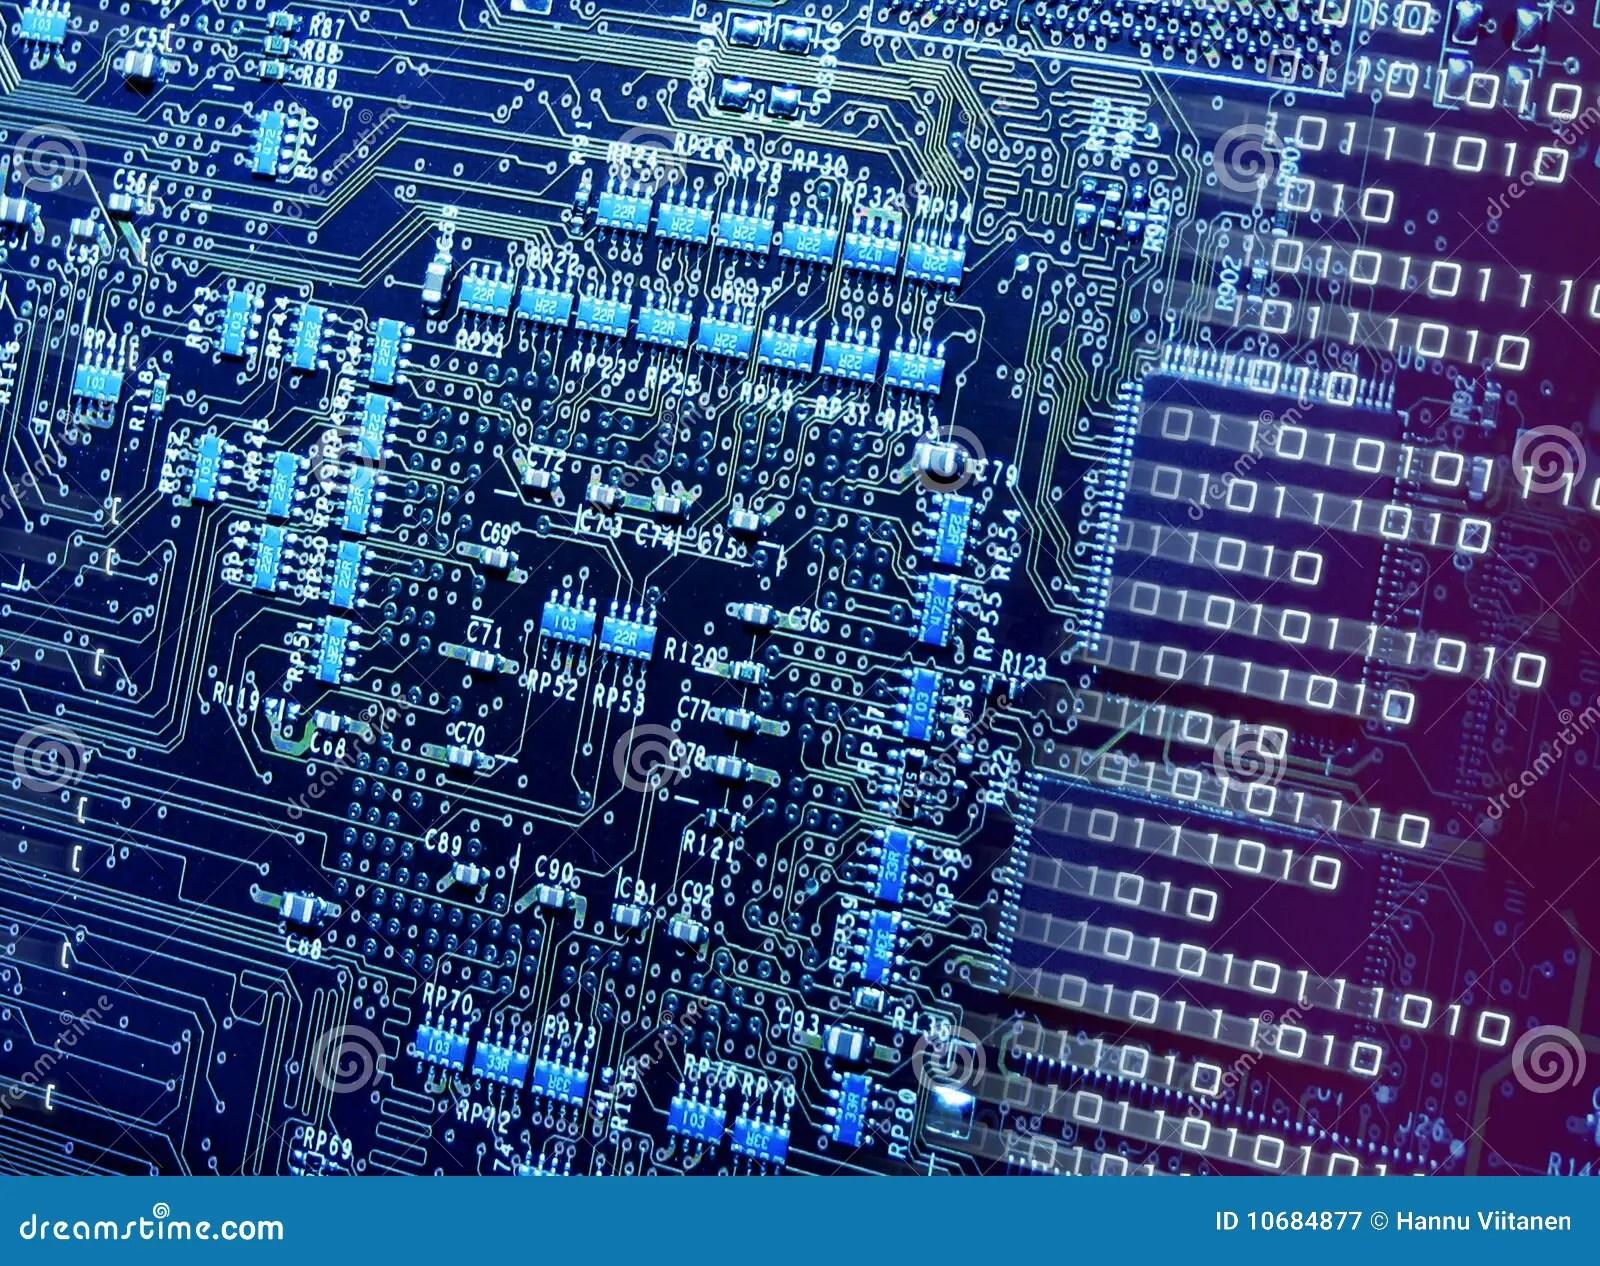 Number Breaking Cpu Circuits Stock Image